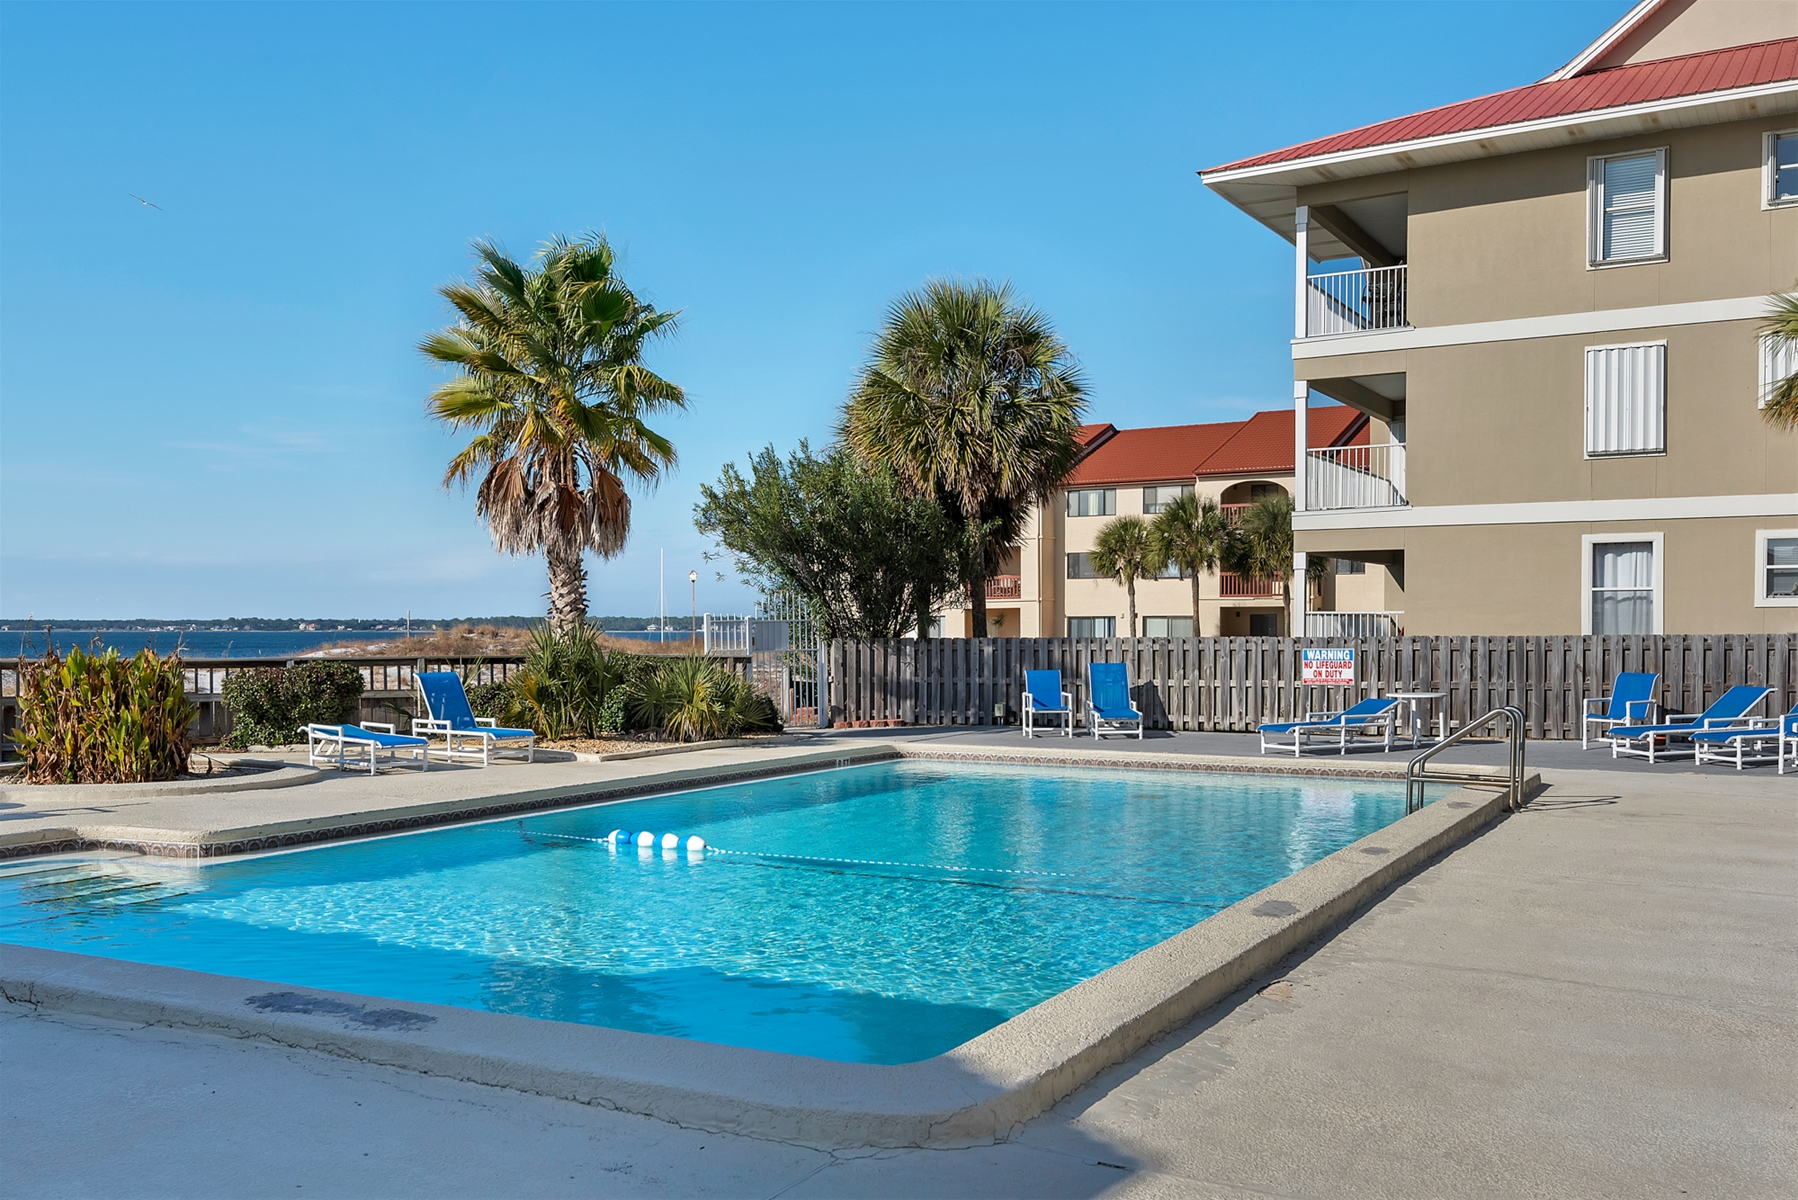 Sunset Harbor Palms navarre beach pool area